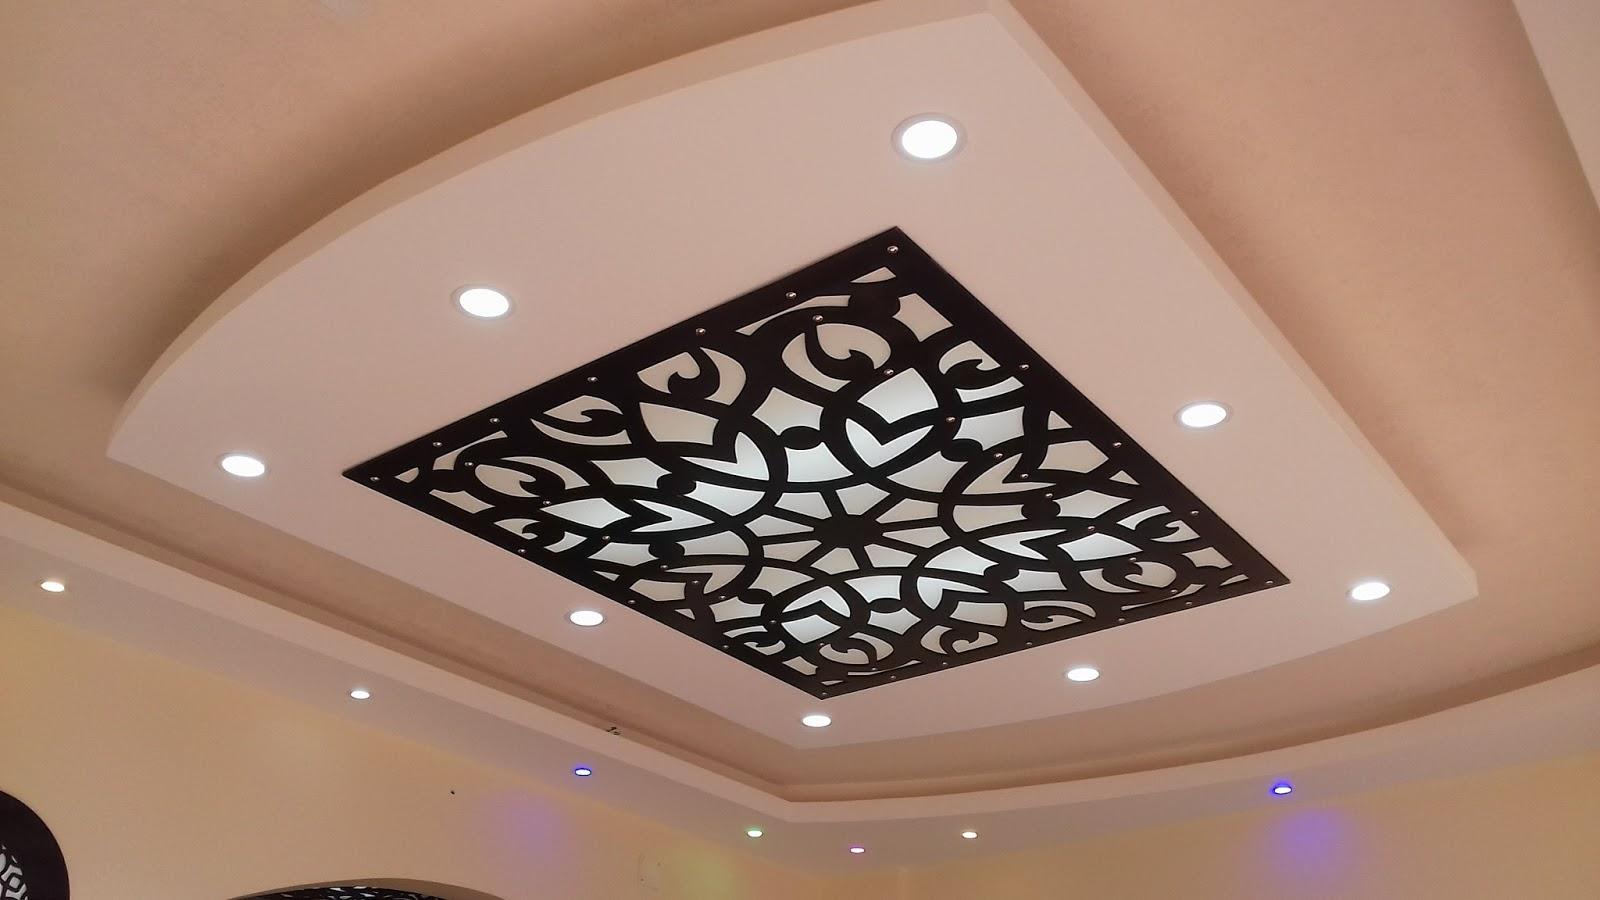 Cnc wood carving designs decor units